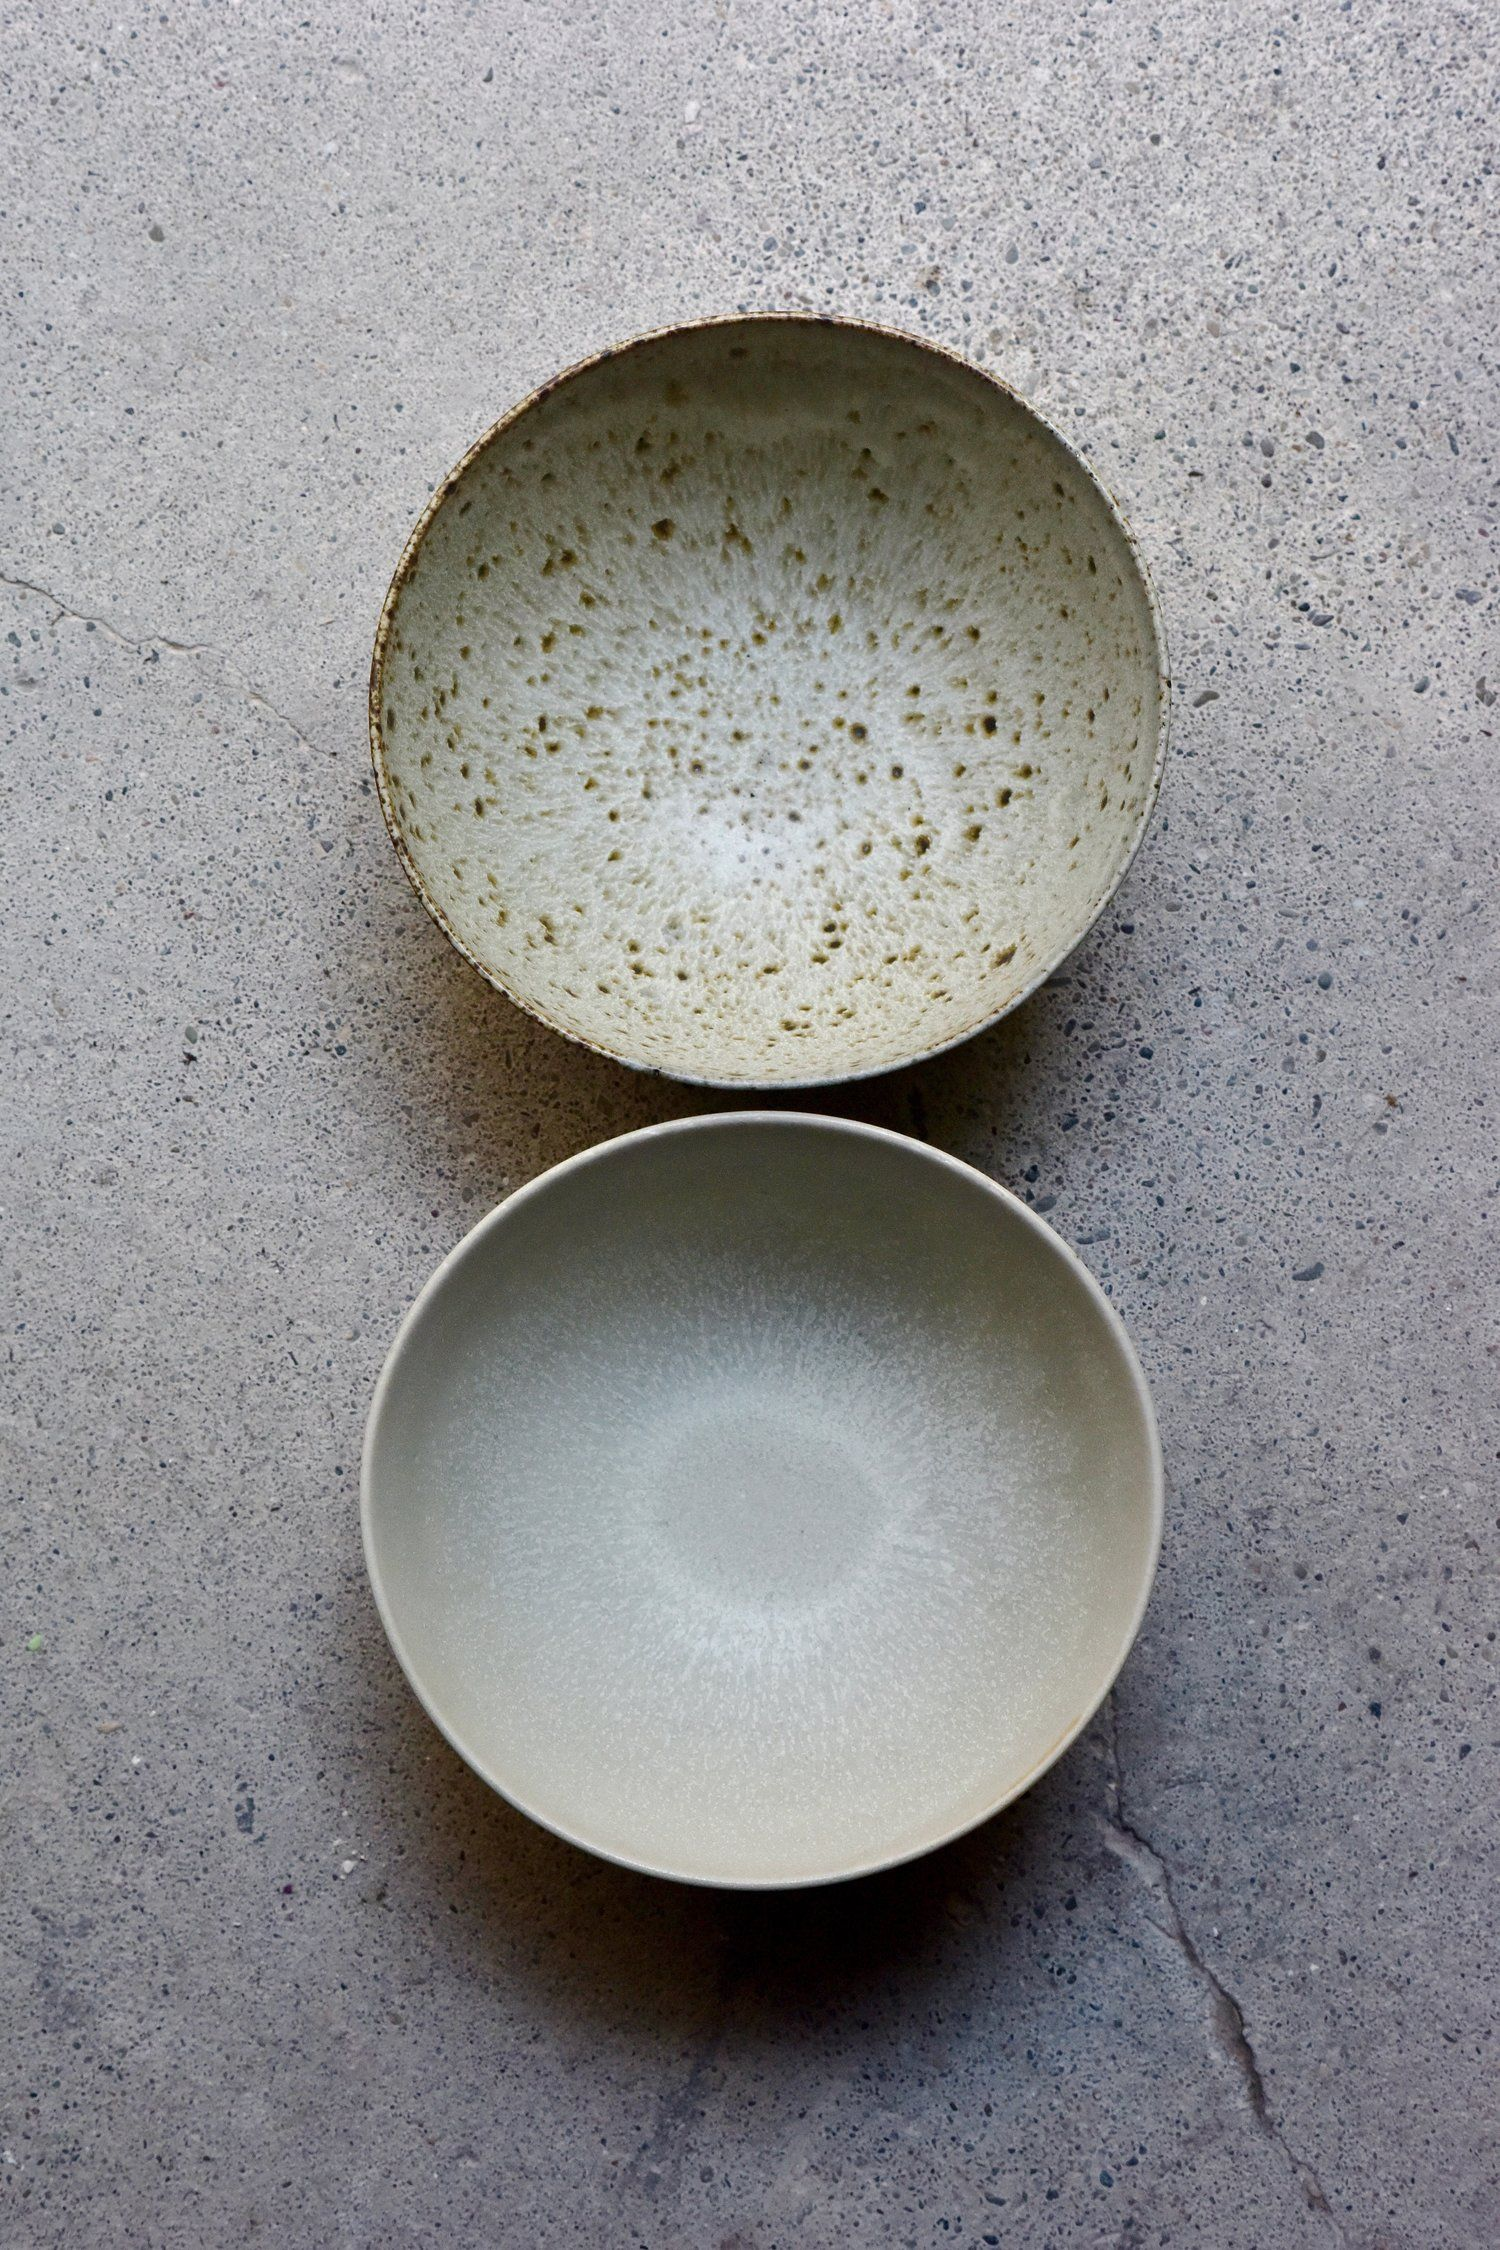 Gallery Bob Dinetz Wheel Thrown Pottery Wheel Thrown Ceramics Pottery Wheel Thrown Pottery